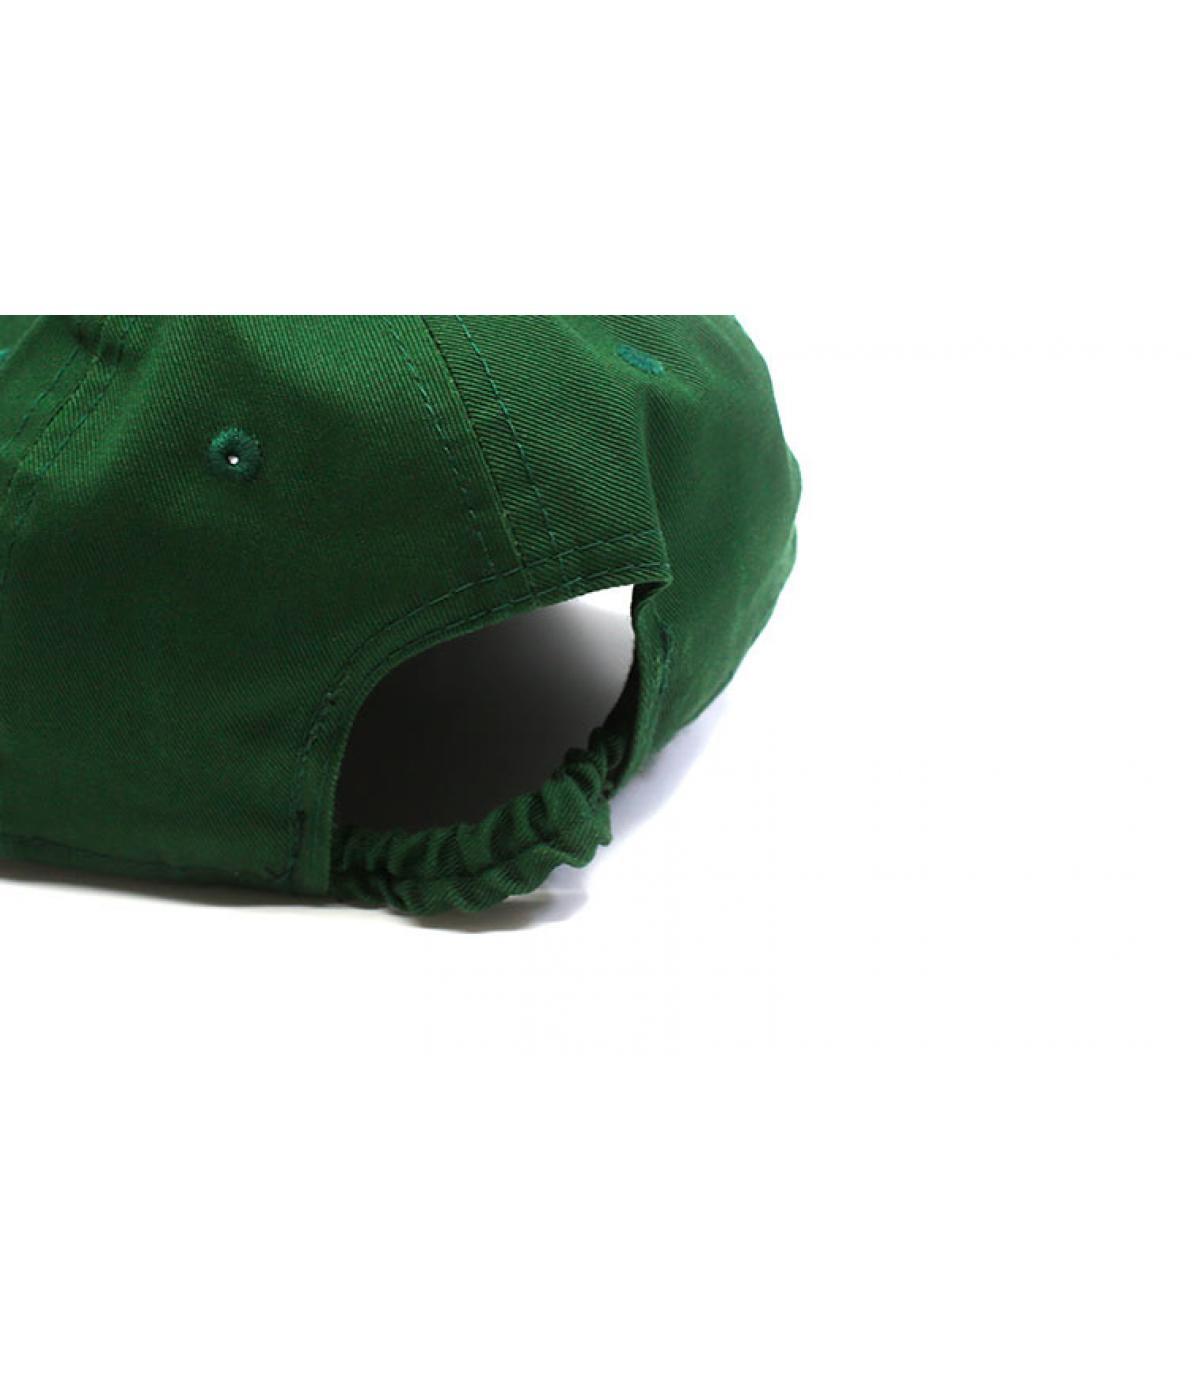 Details Infant League Ess NY green black - afbeeling 5